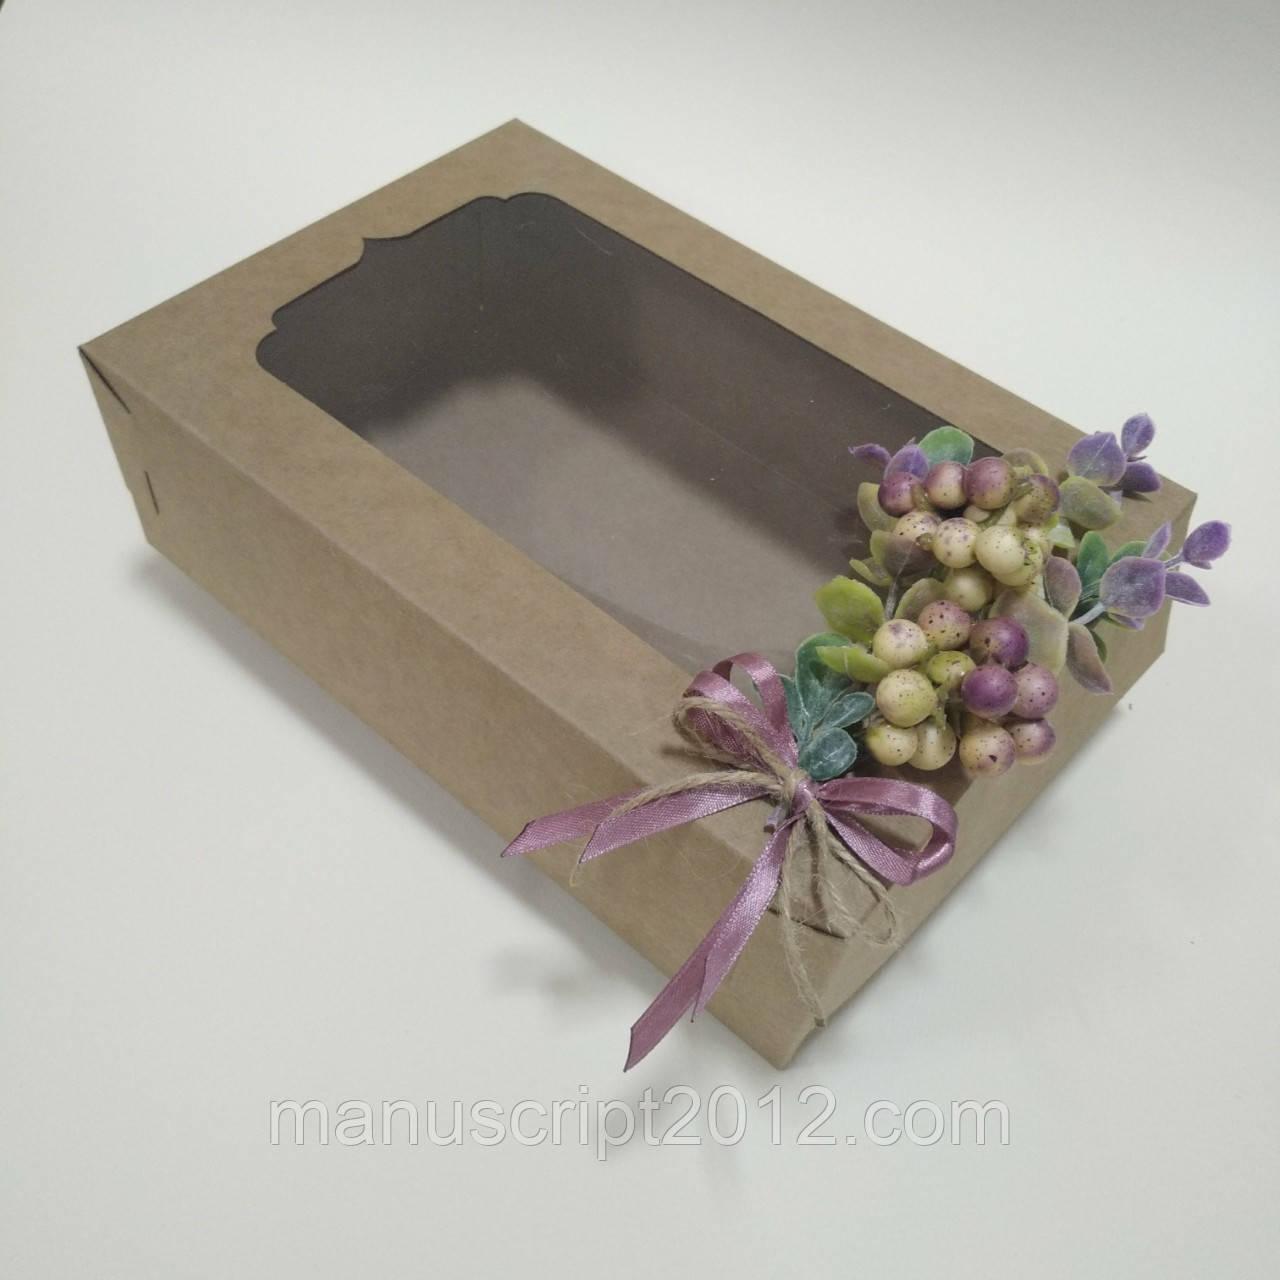 "Коробка  крафт 250х170х80 мм """"Эвкалипт с ягодами глода"""""